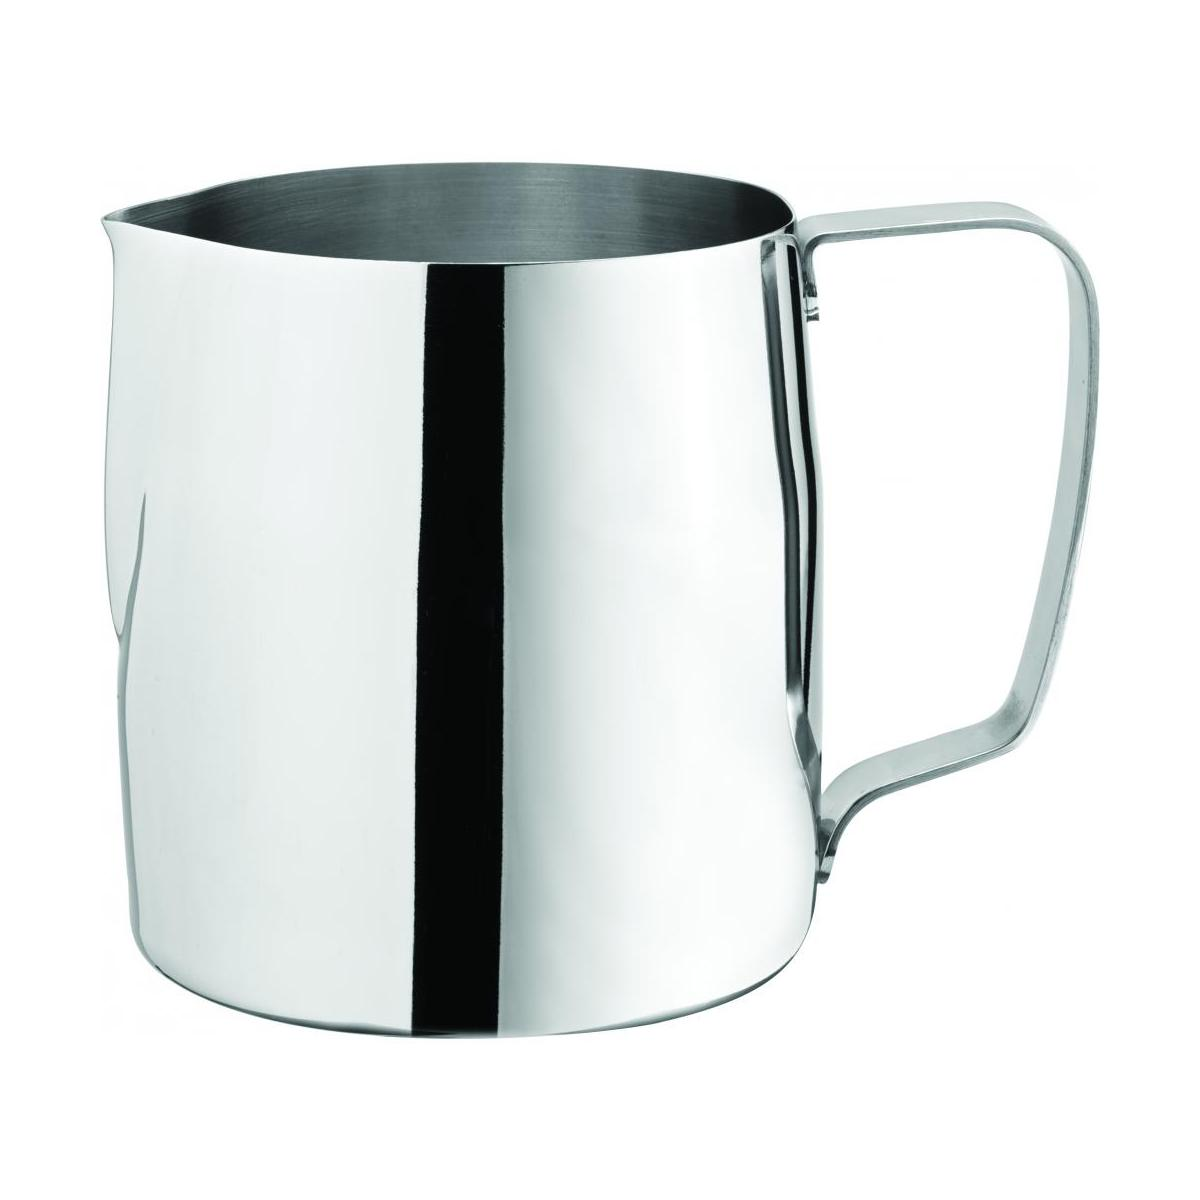 stainless steel milk frothing jug 35oz 98cl noble express. Black Bedroom Furniture Sets. Home Design Ideas